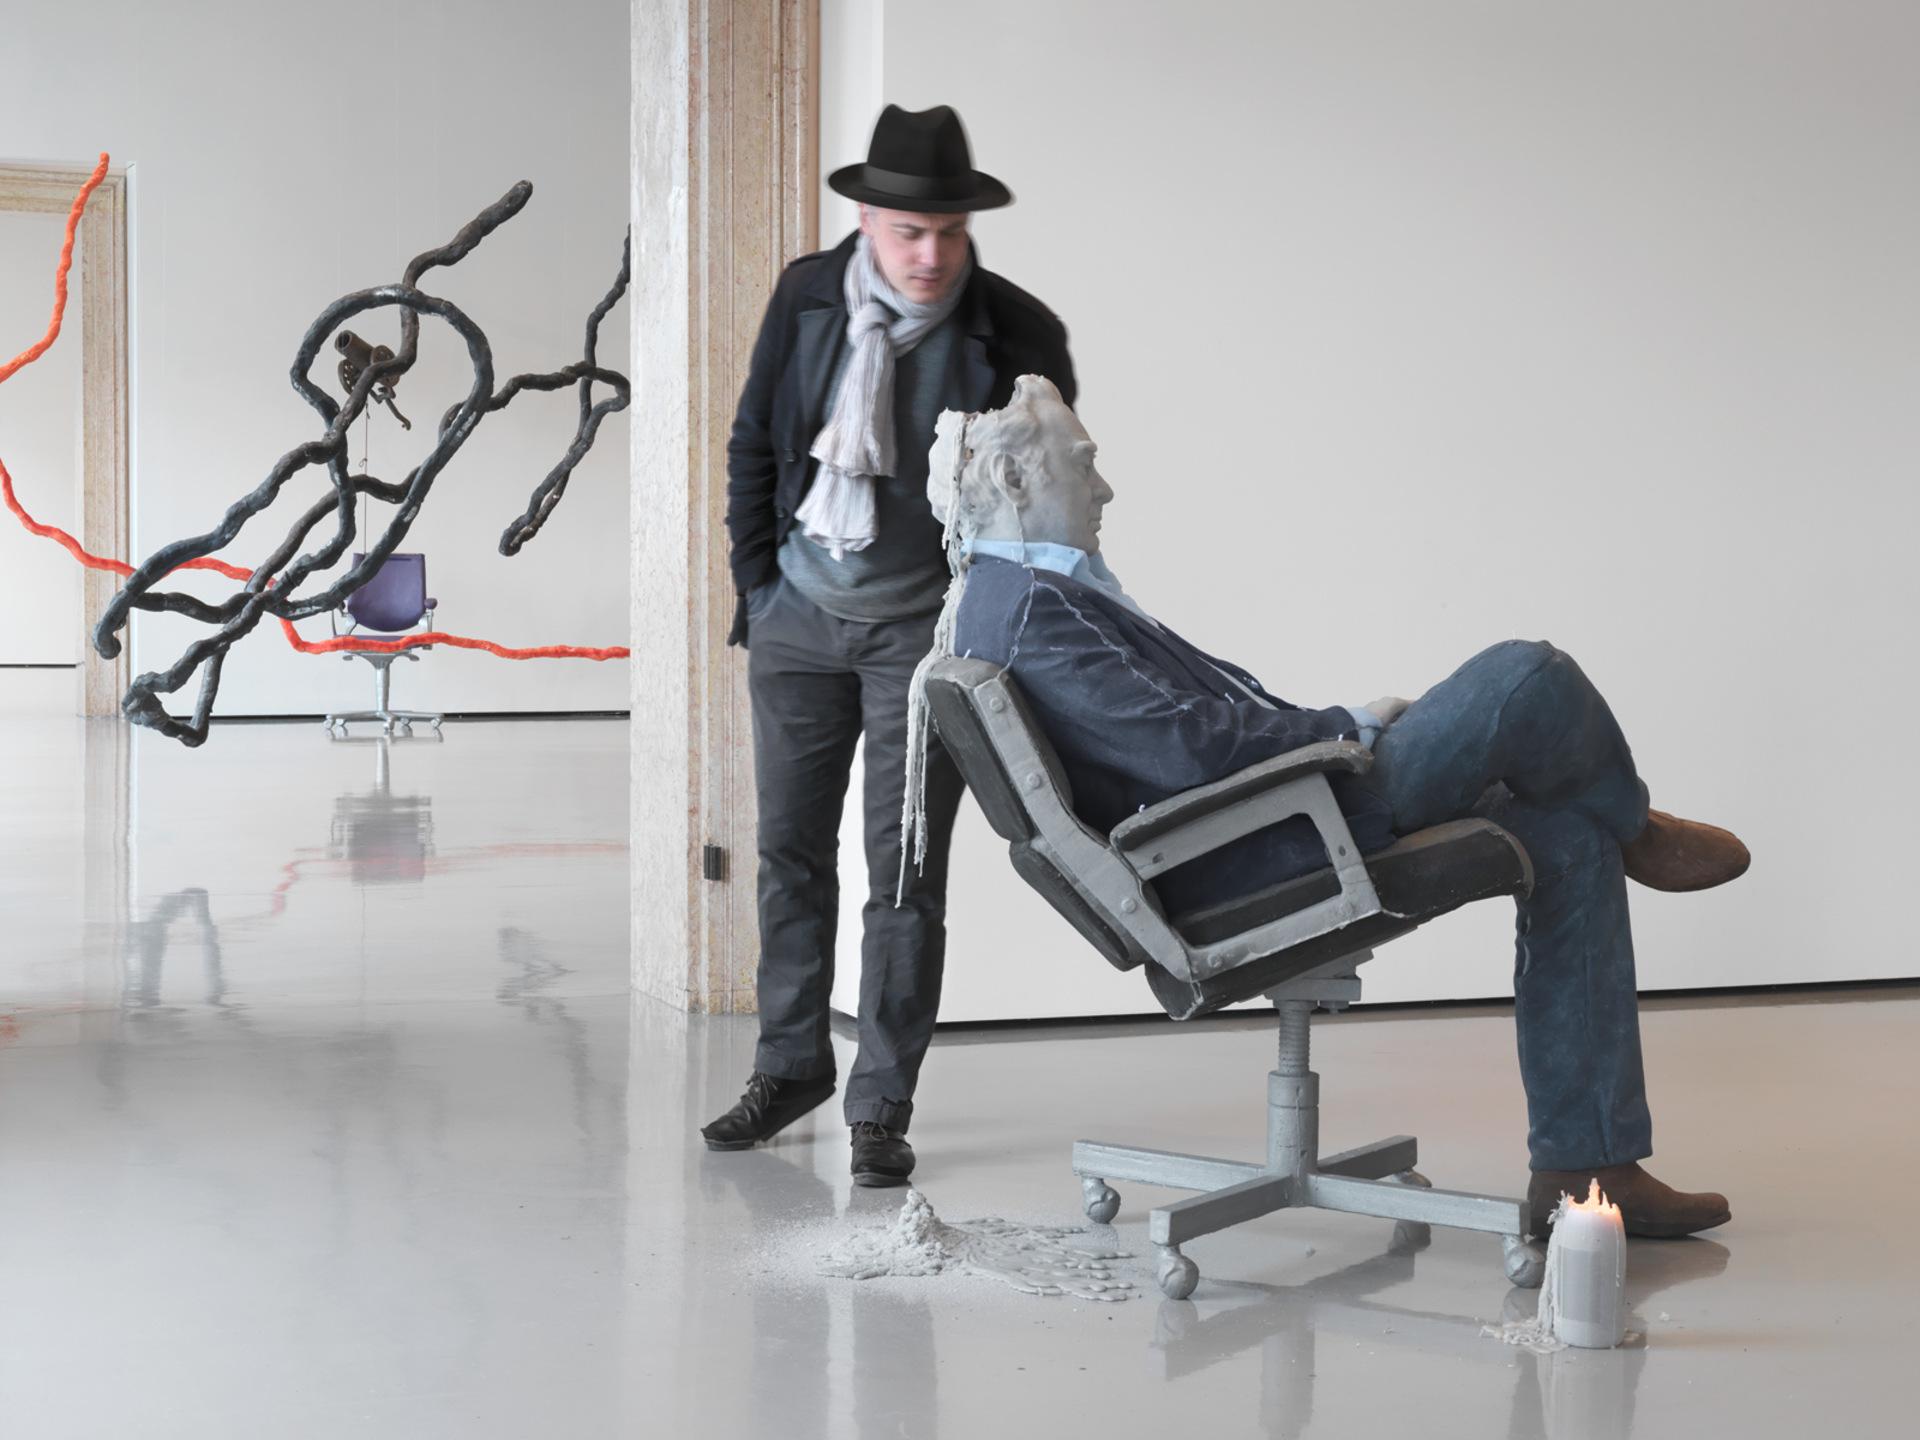 Untitled; Cioran Handrail; Spinoza Rhapsody; A Thing Called Gearbox;